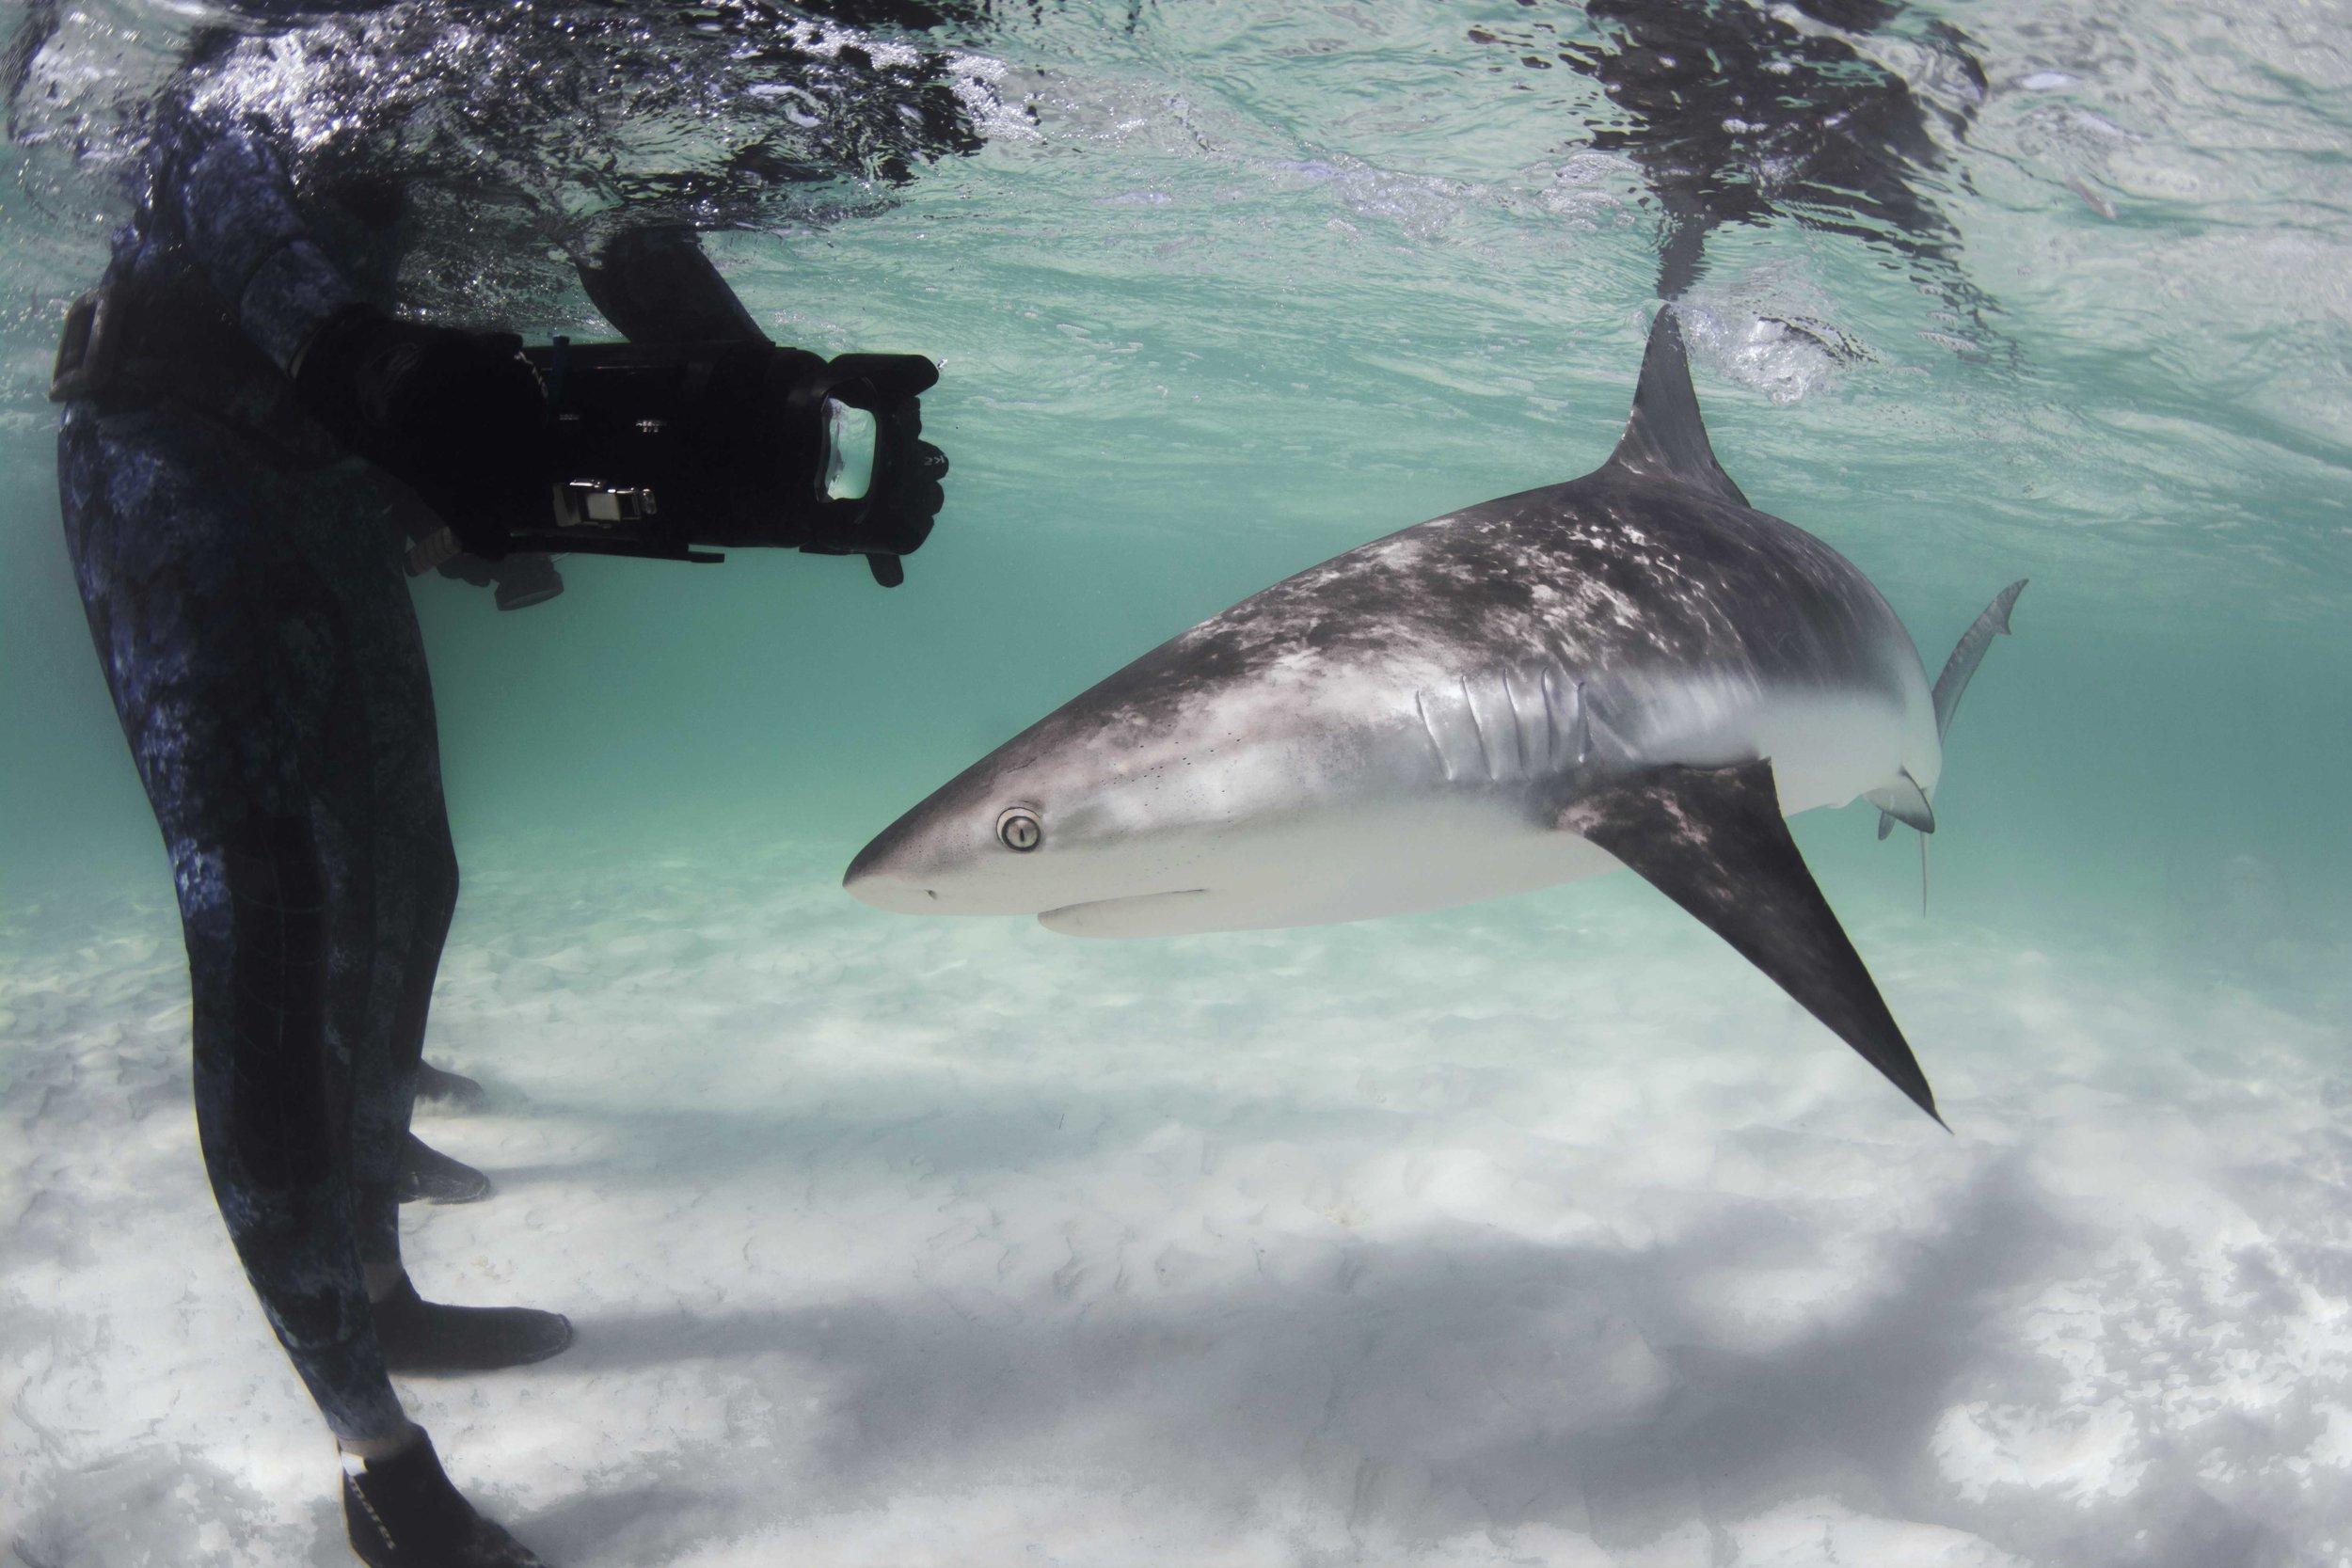 A confident Caribbean reef shark makes a close pass